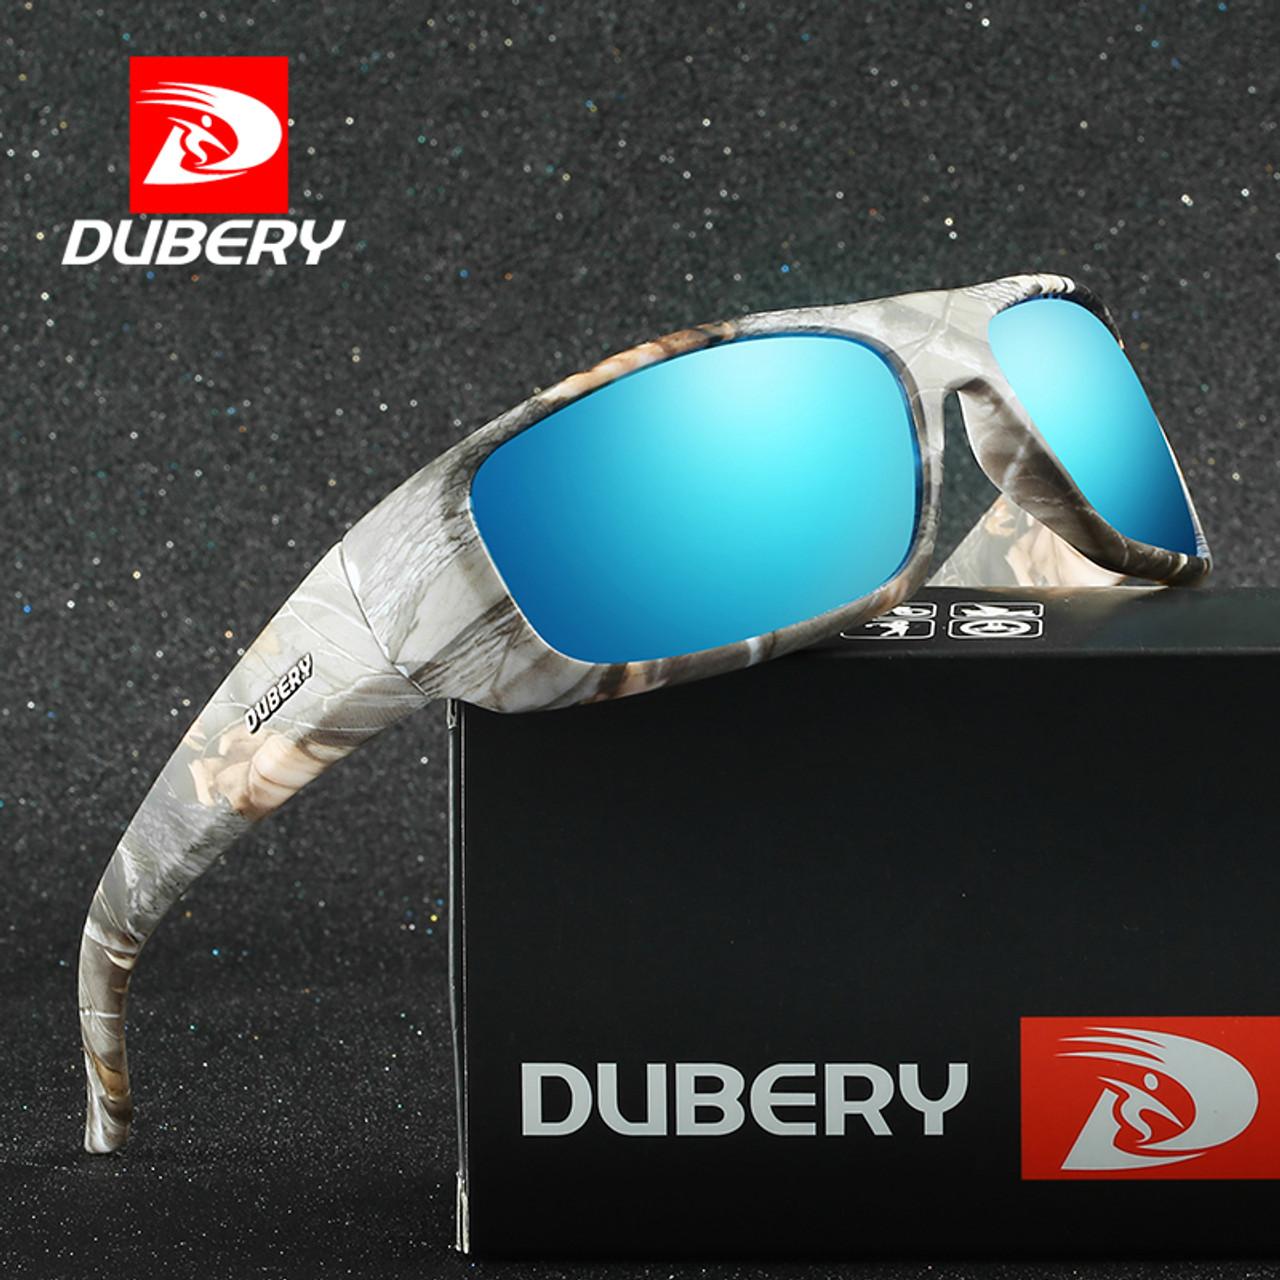 c0d6009fd8 DUBERY 2018 Men s Polarized Sunglasses Aviation Driving Shades Male Sun  Glasses Men Retro Sport Luxury Brand ...